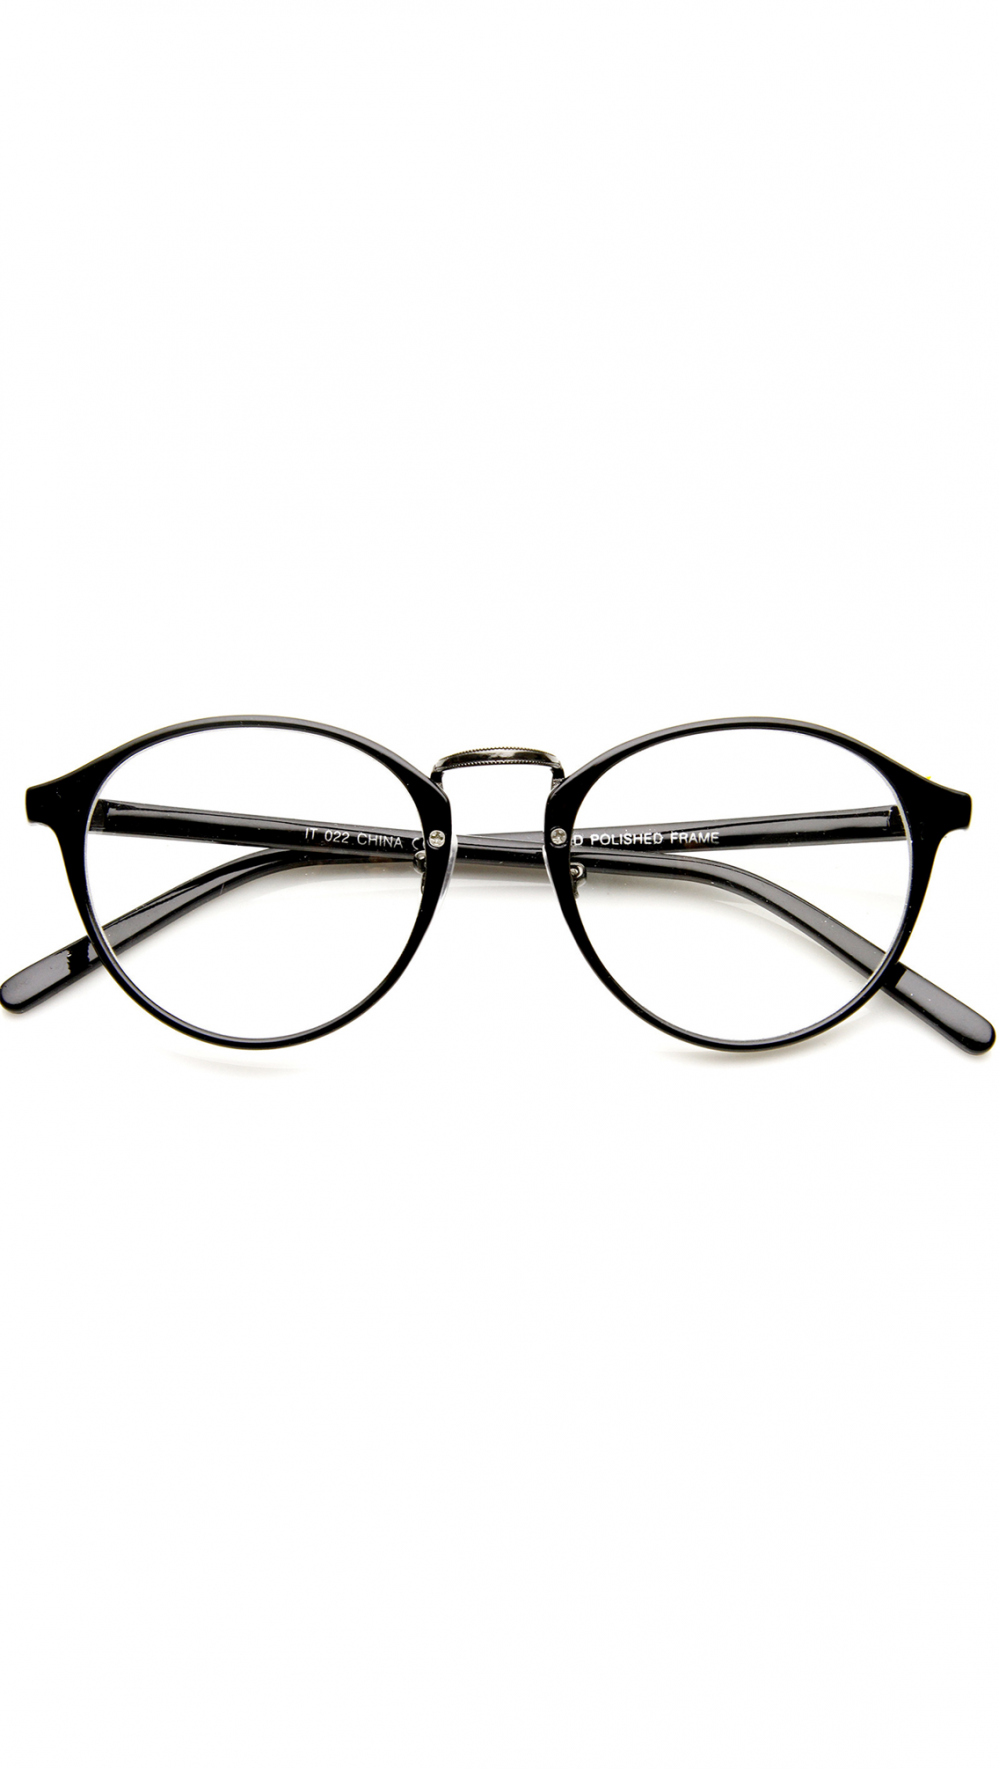 30d395c788 Loja Nicoleta: moda cool e divertida ♡ Óculos Vintage Lentes, Gafas,  Cristales,